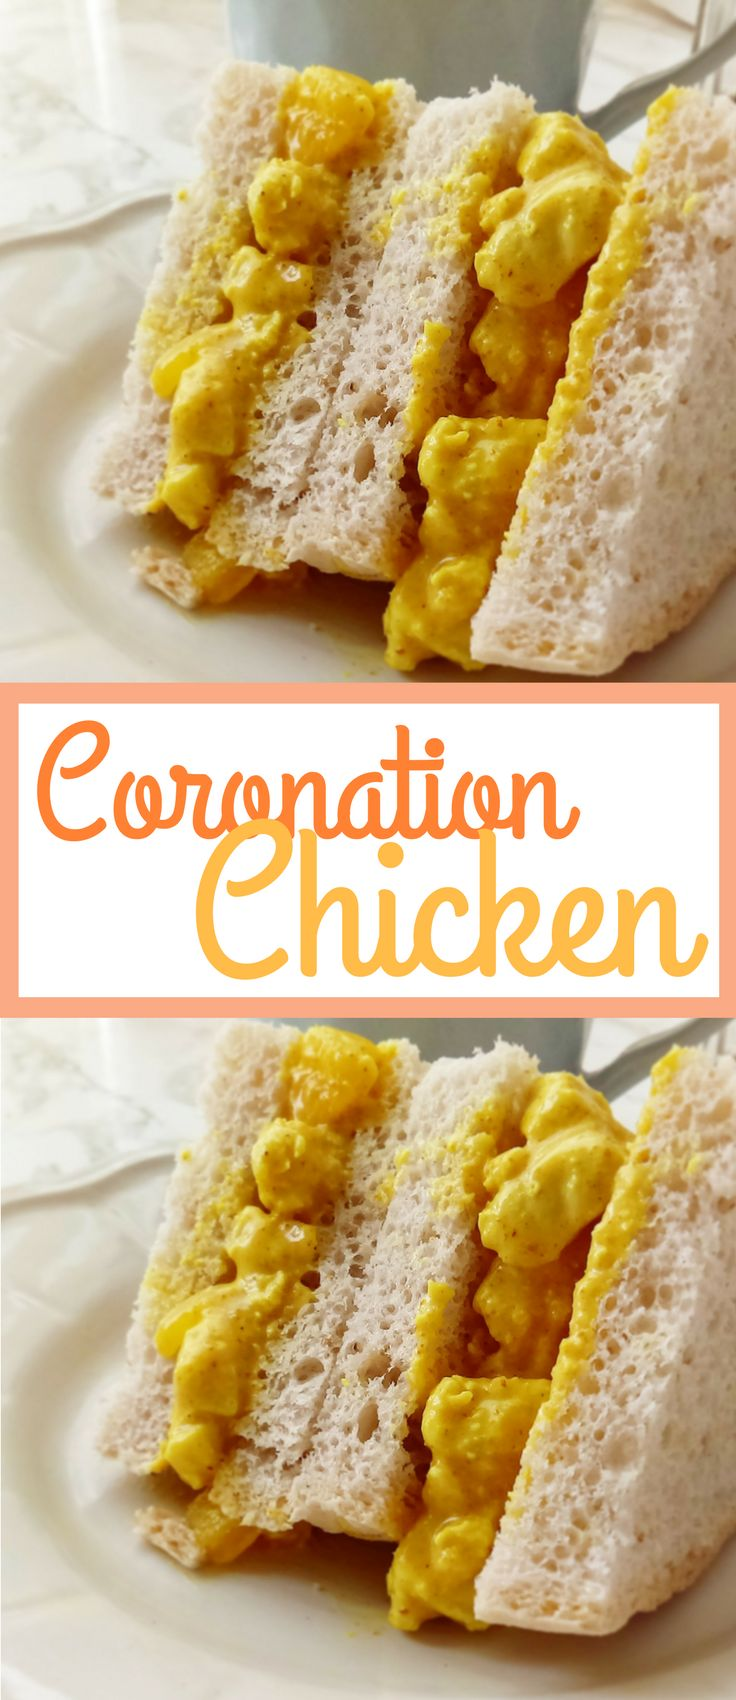 Easy Coronation Chicken - the perfect sandwich filling for fafternoon tea! Recipe via @BryJaimea